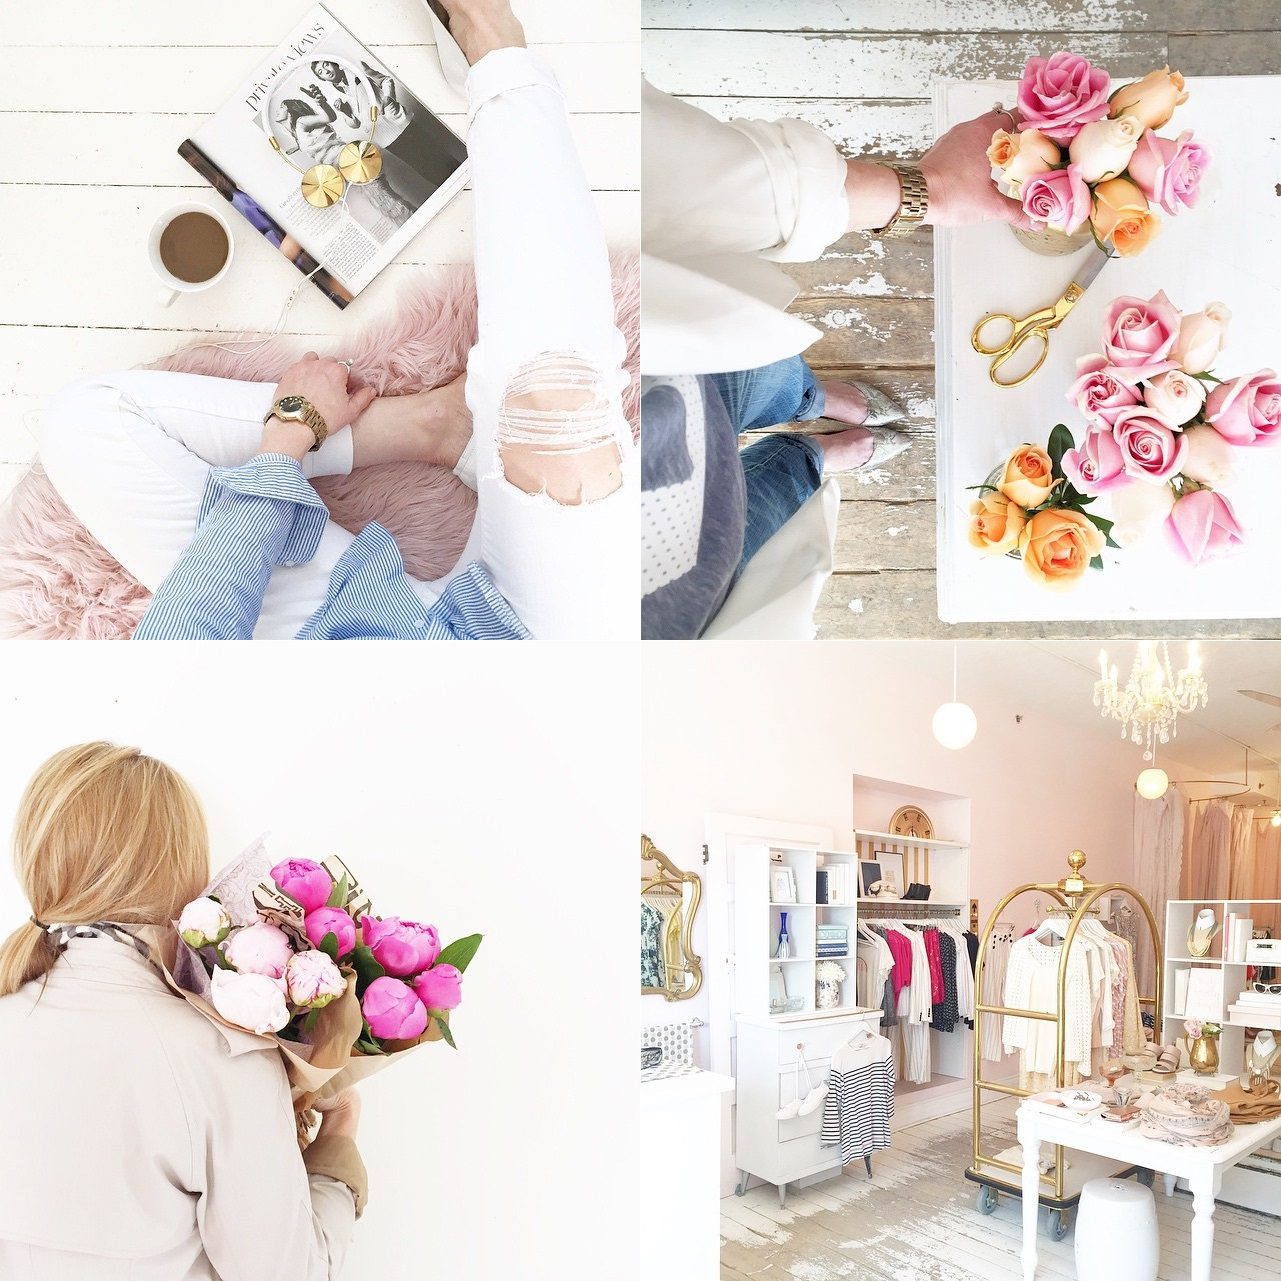 instagram-seguir-blushshop